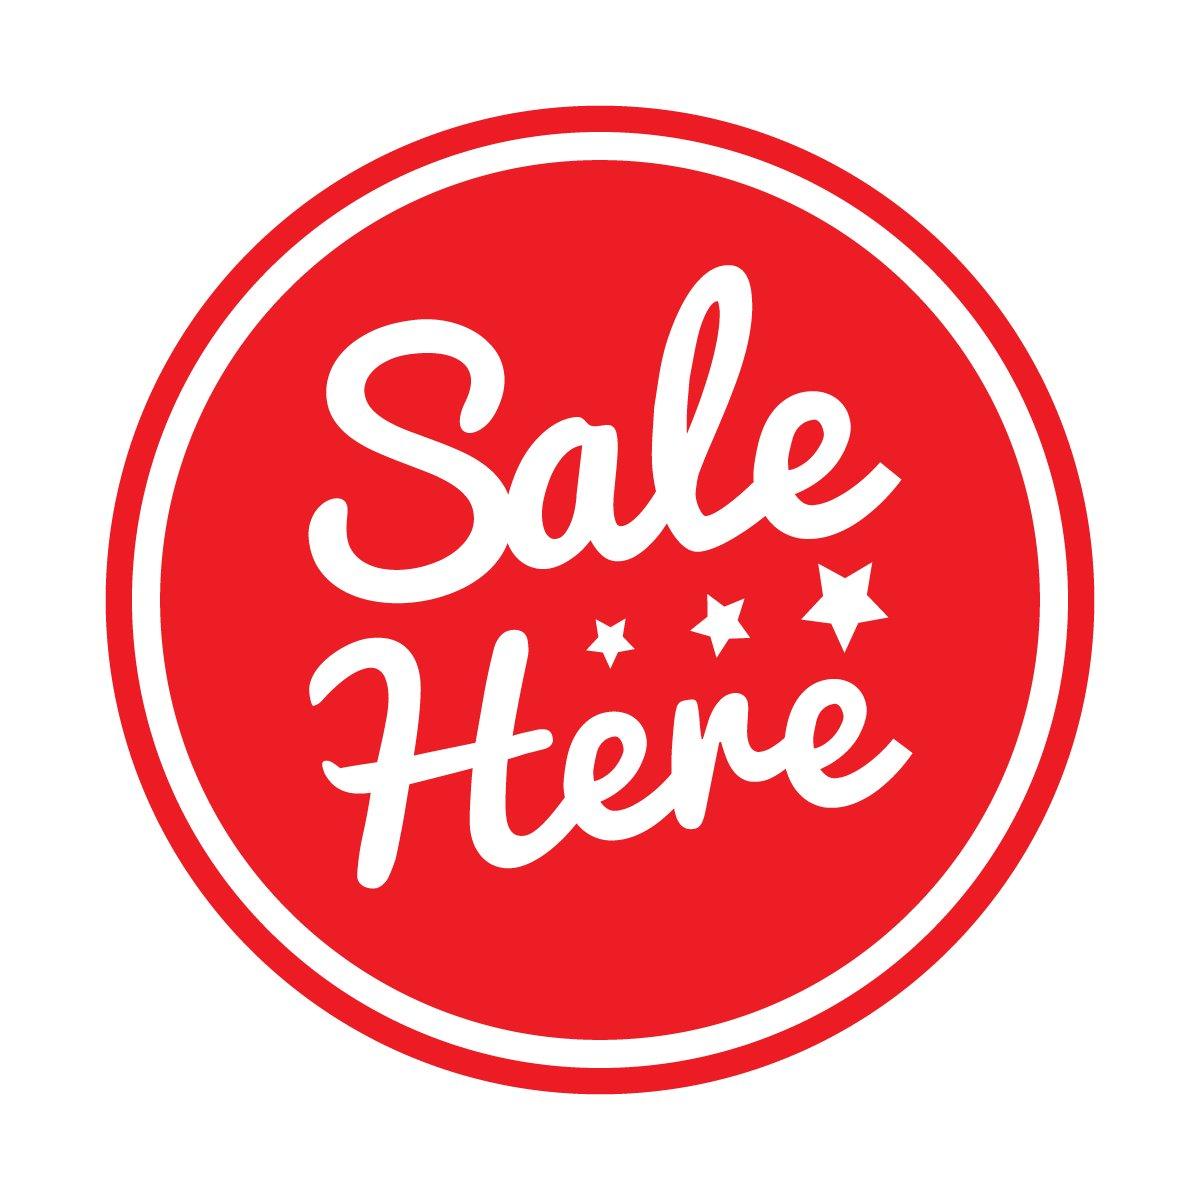 Sale Here - อะไรลดเรารู้